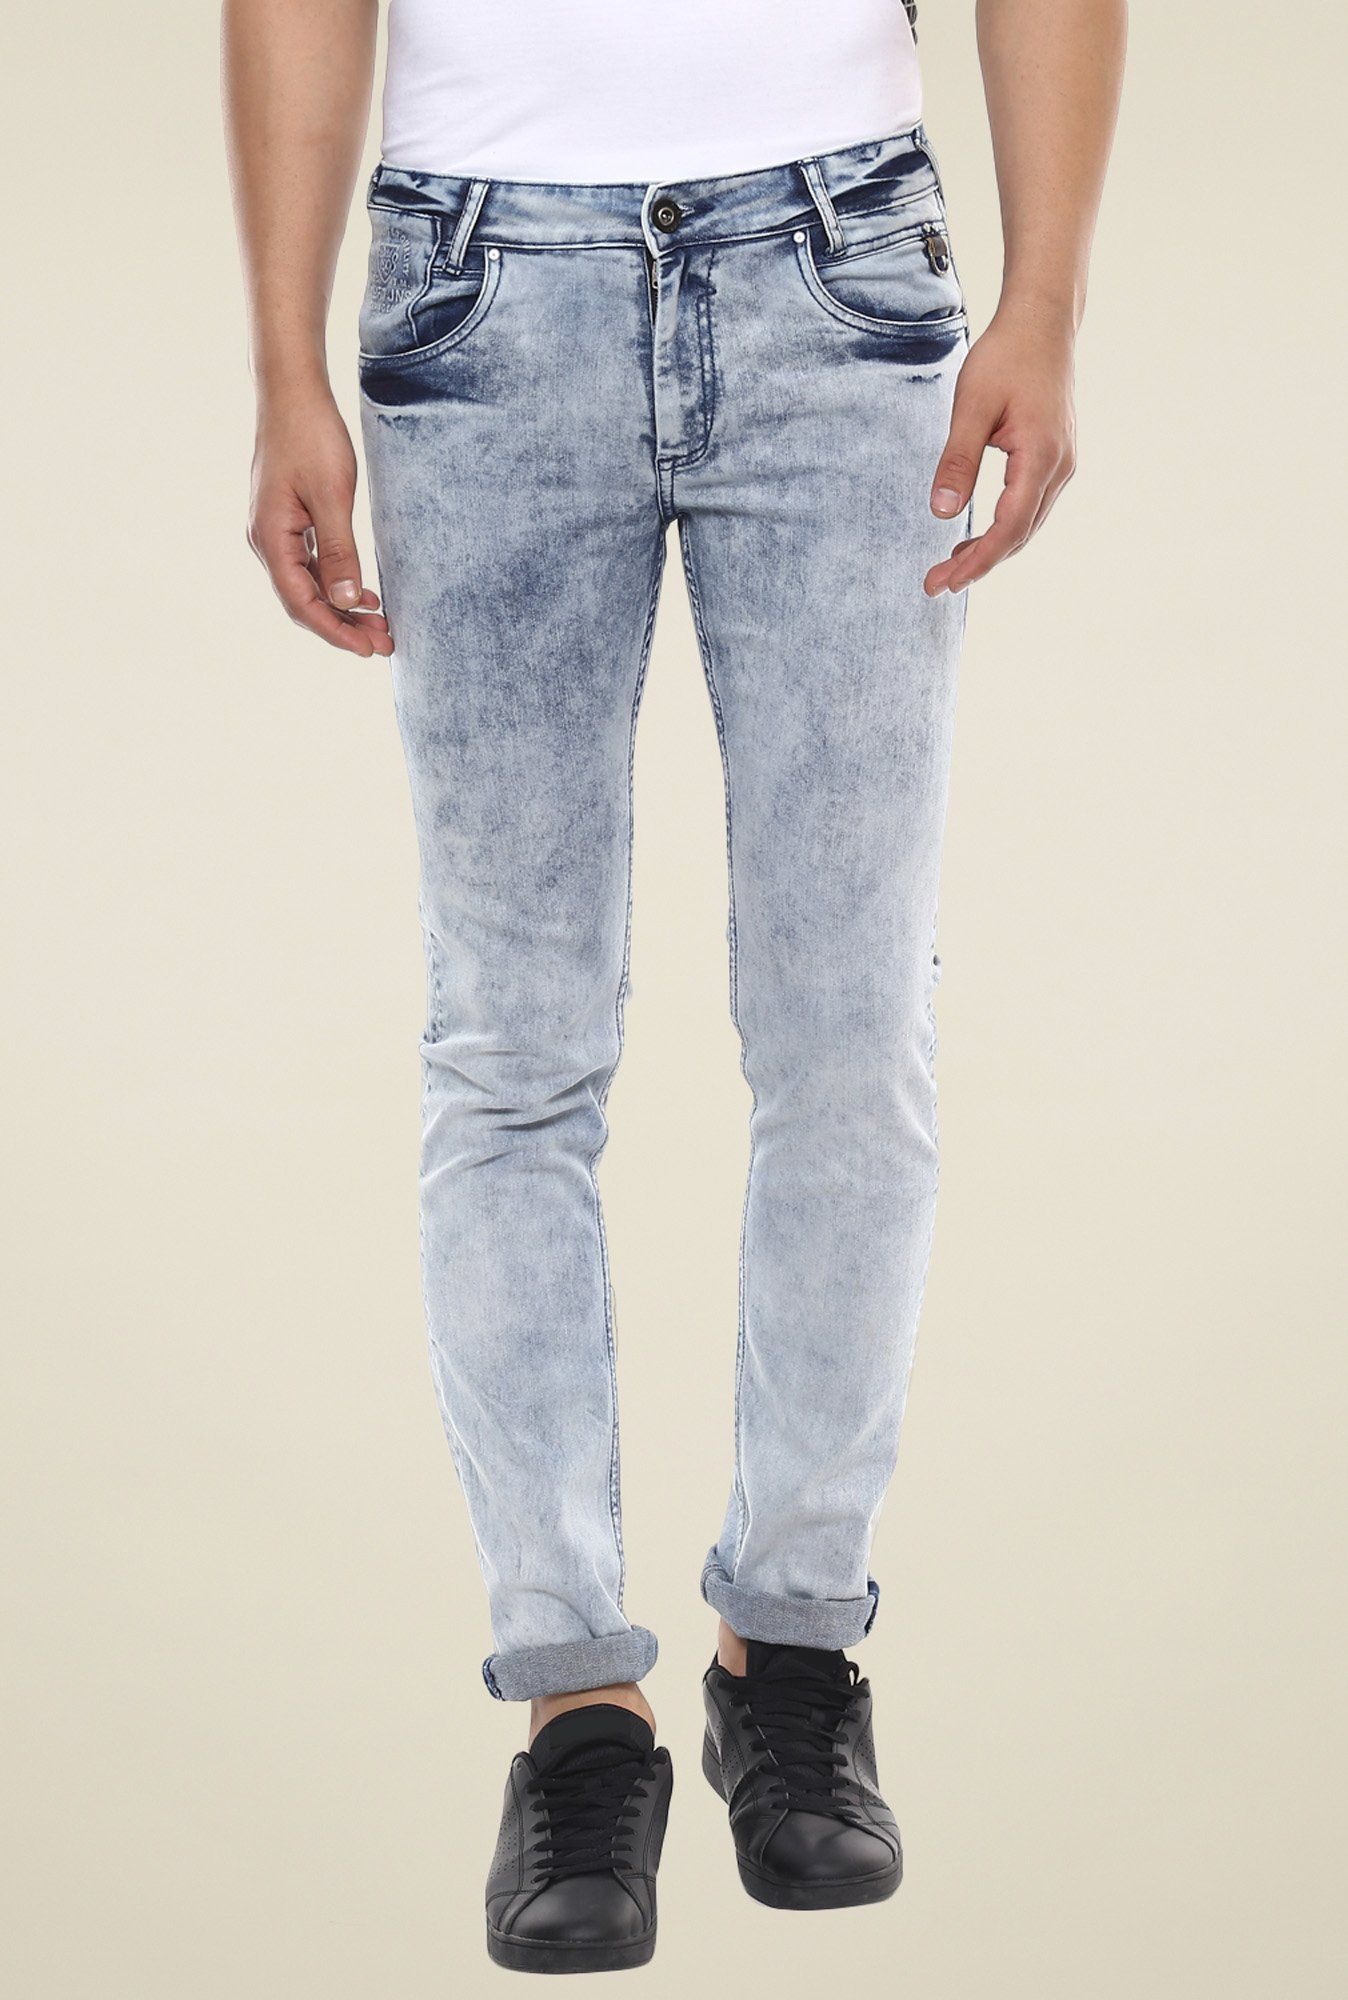 acid wash jeans trend